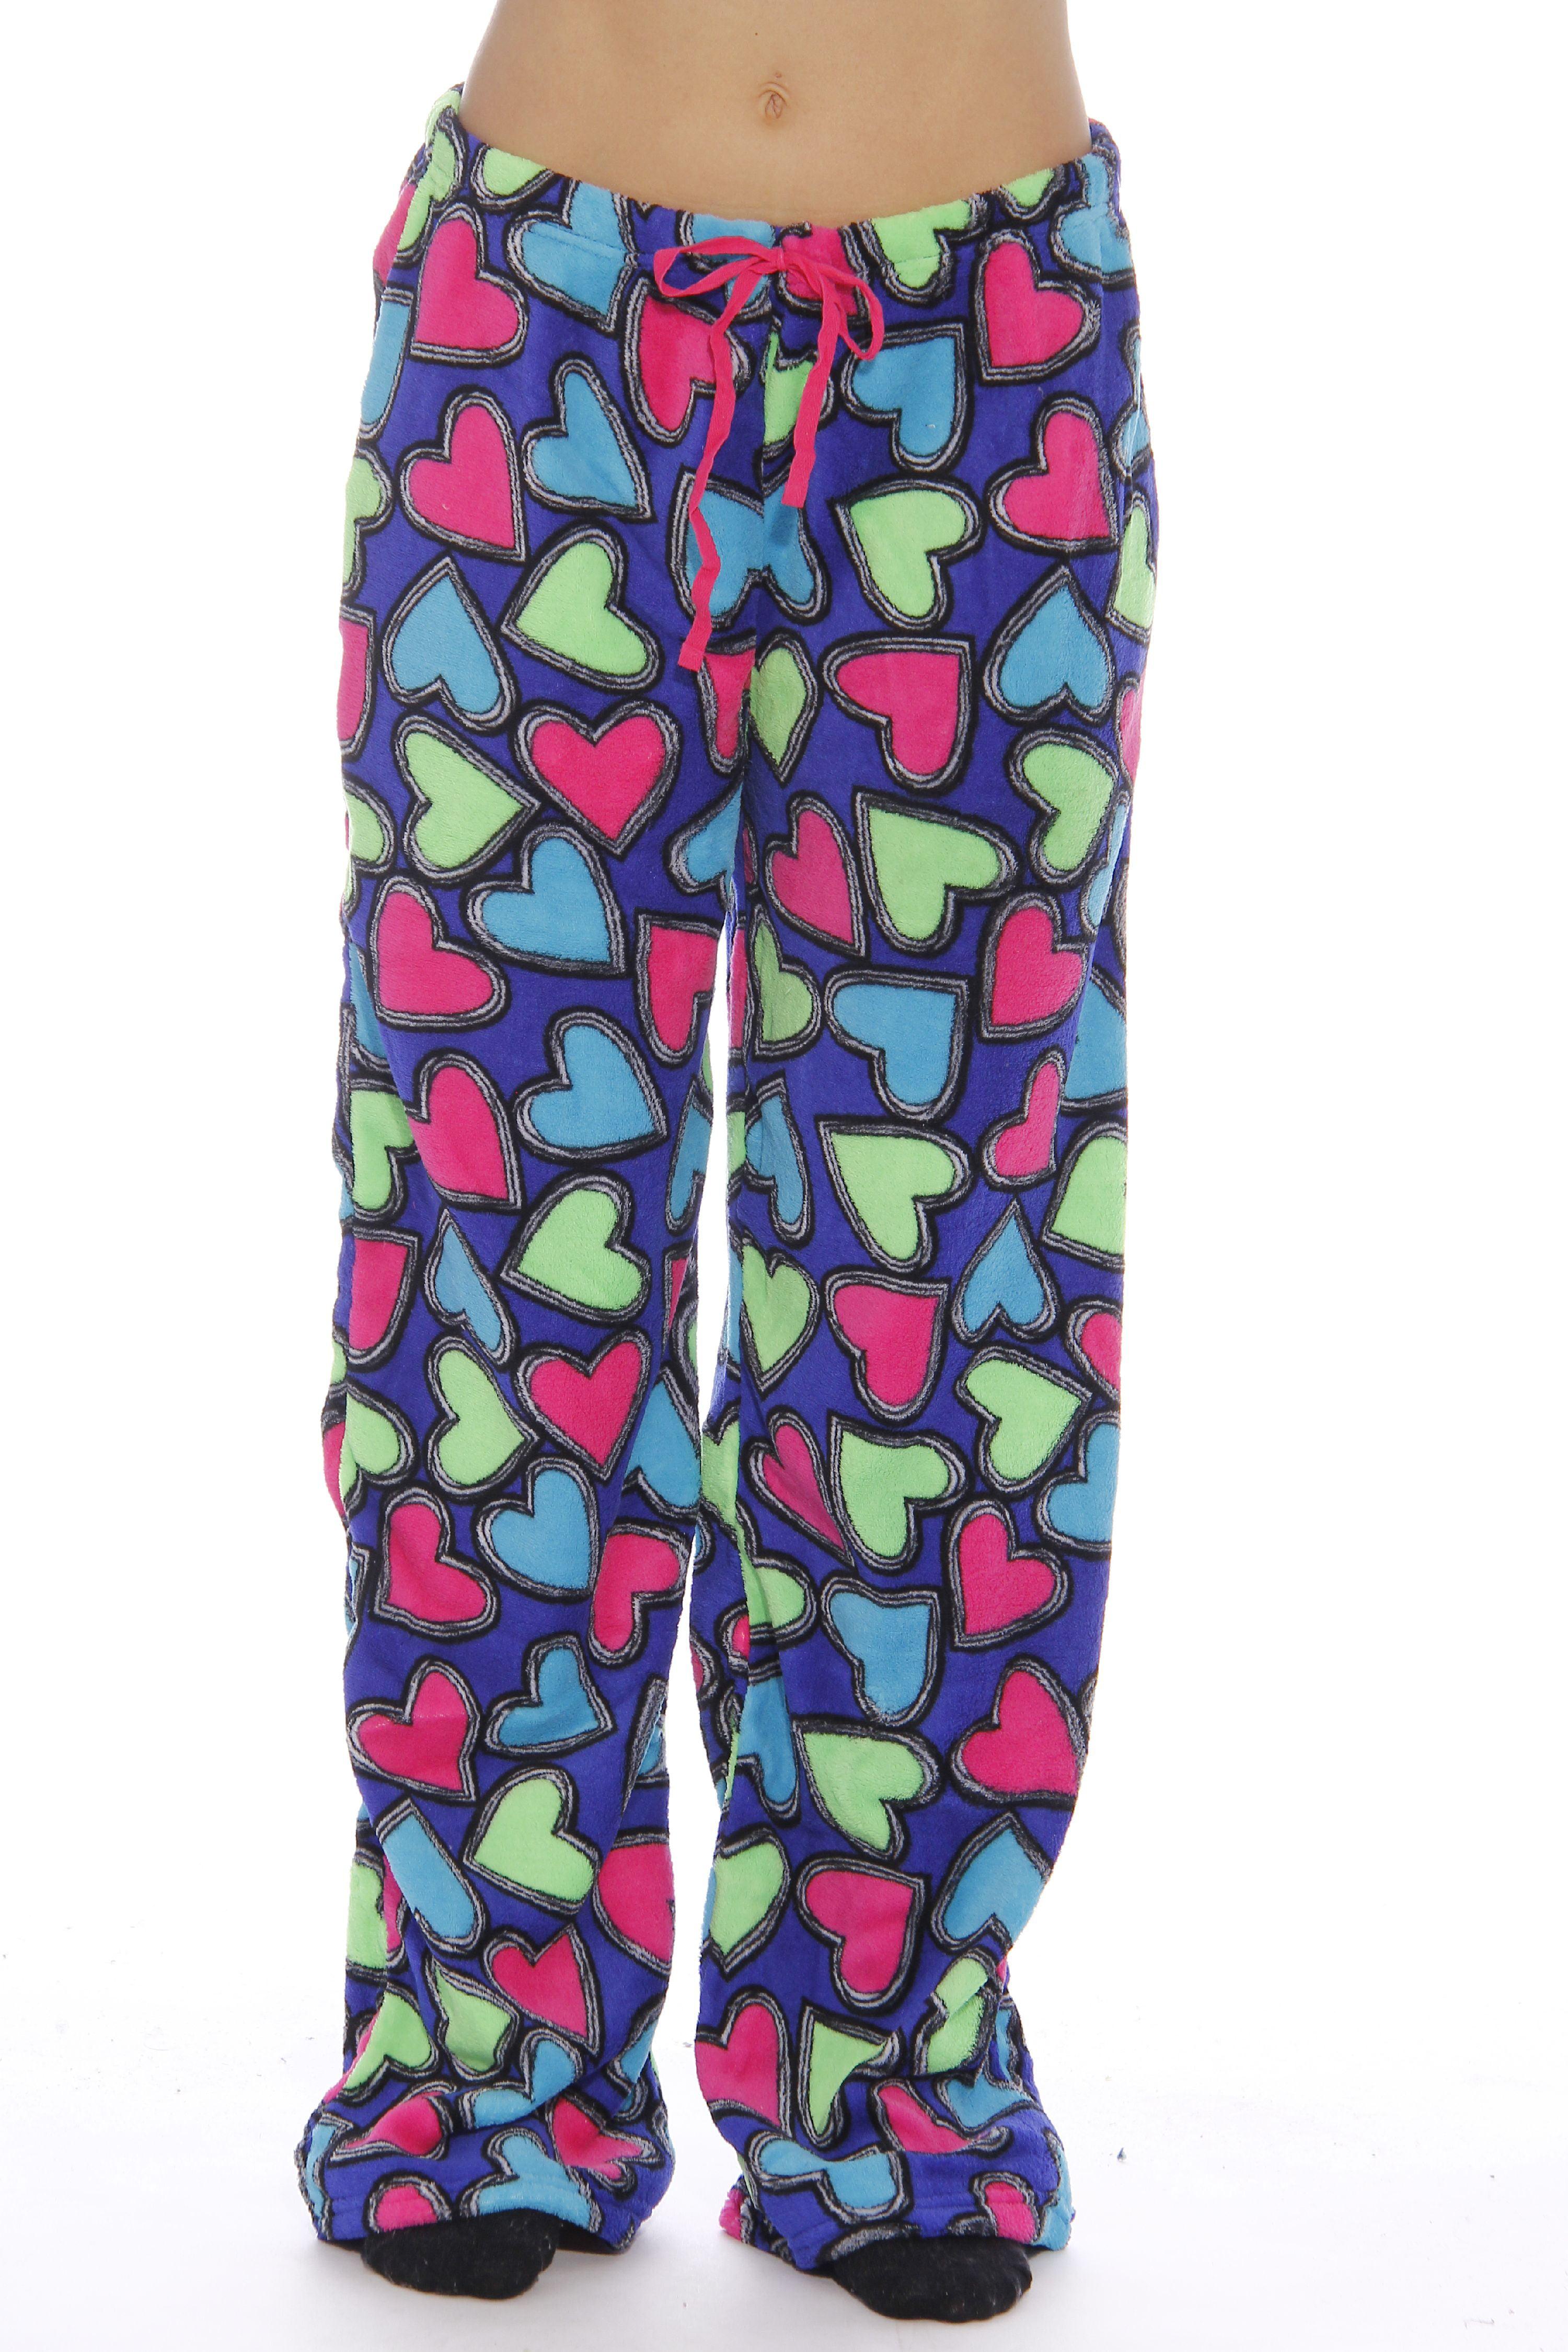 fe8b7dec93 Just Love Women s Plush Pajama Pants - Petite to Plus Size Pajamas (Party  Hearts